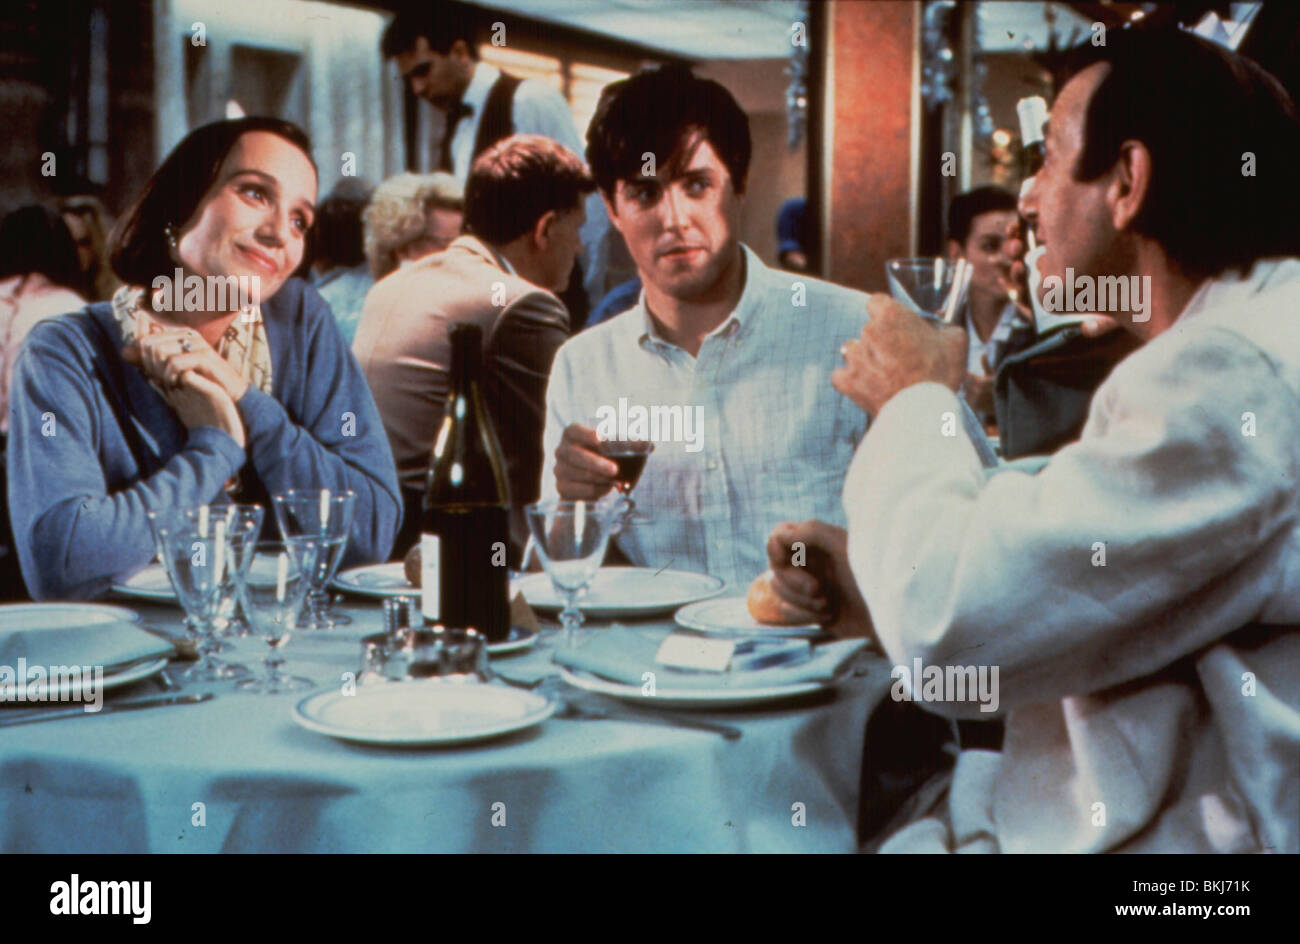 BITTER MOON (1992) KRISTIN SCOTT THOMAS, HUGH GRANT, PETER COYOTE BTM 031 - Stock Image